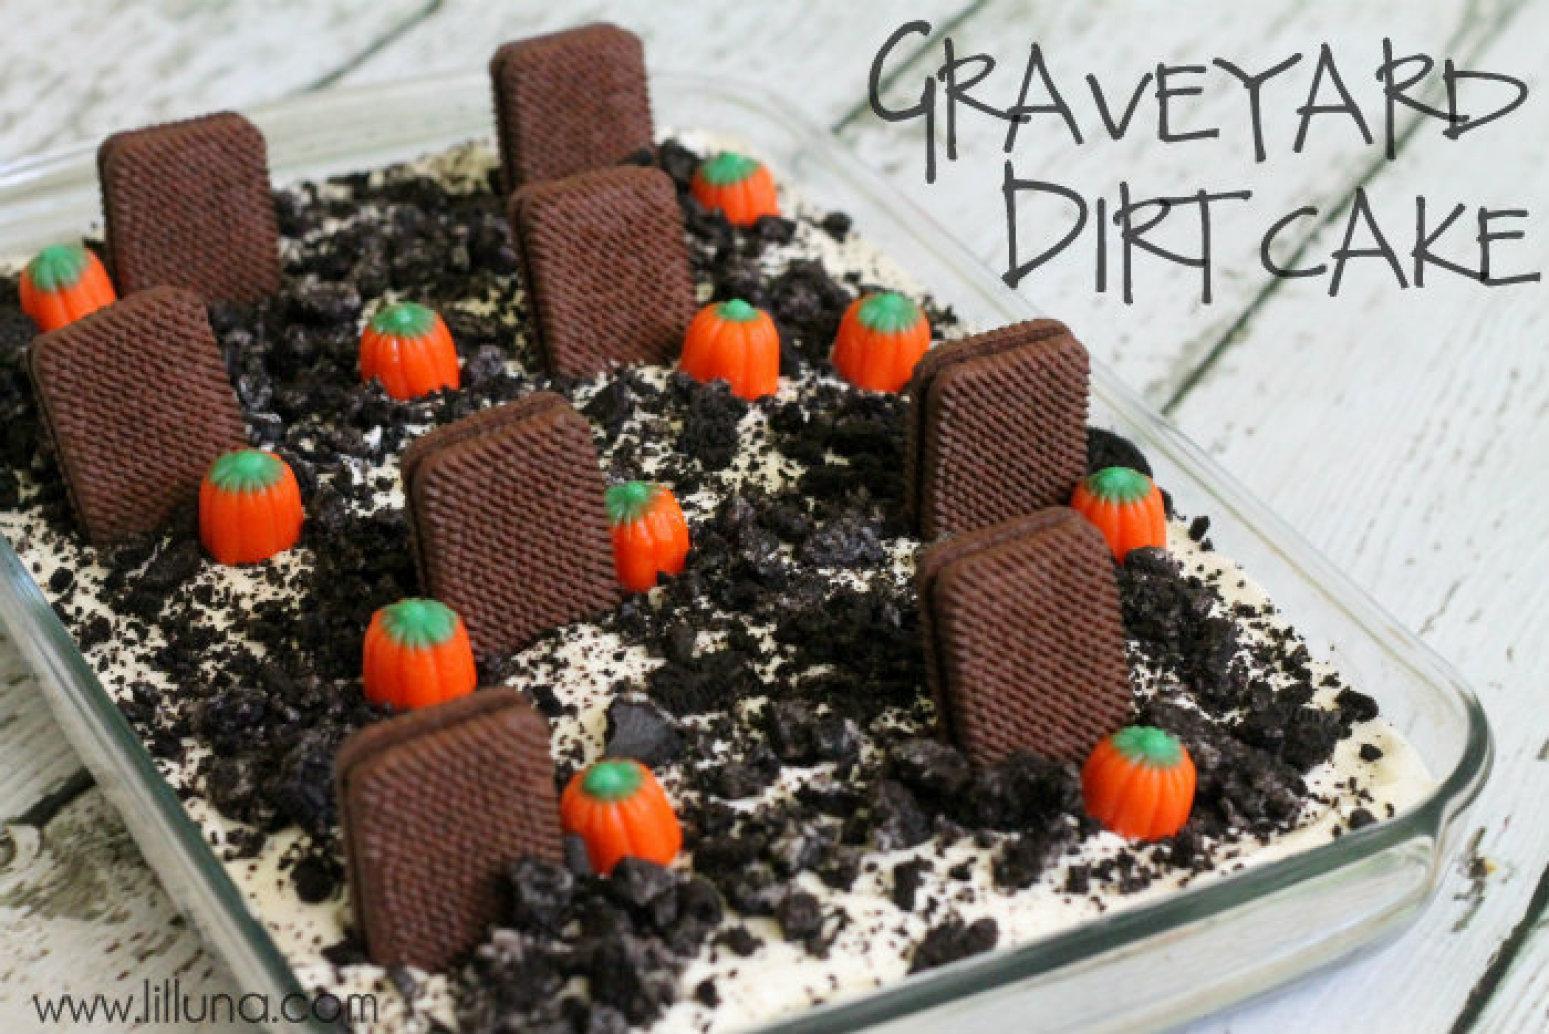 Dirt Cake Ideas For Halloween : Graveyard Dirt Cake Recipe Just A Pinch Recipes